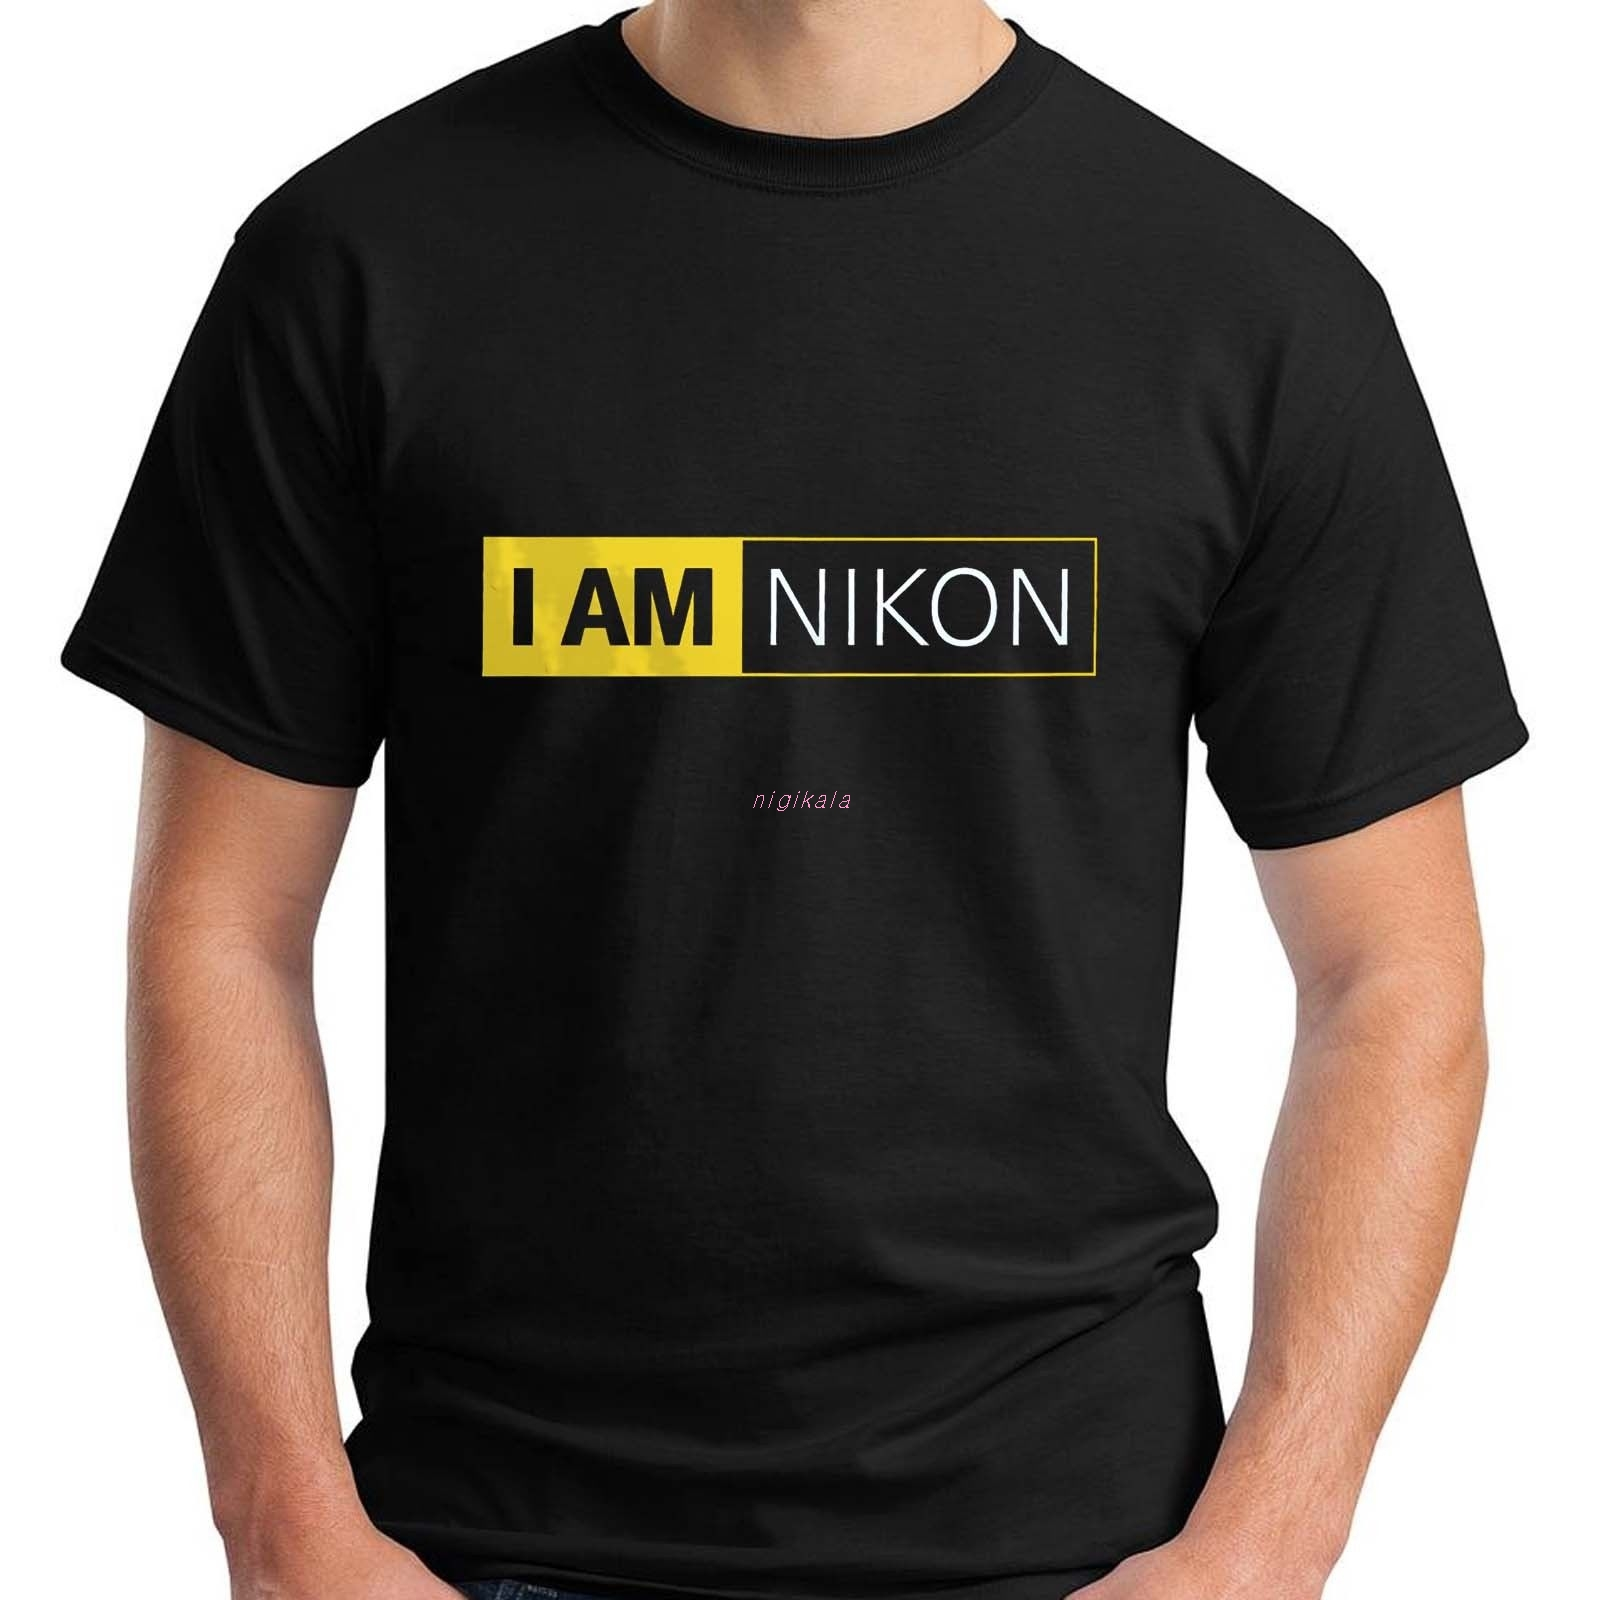 New I AM NIKON - Camera Logo Black Men's T-Shirt Size S-3XL Hip Hop  Funny T Shirts Streetwear